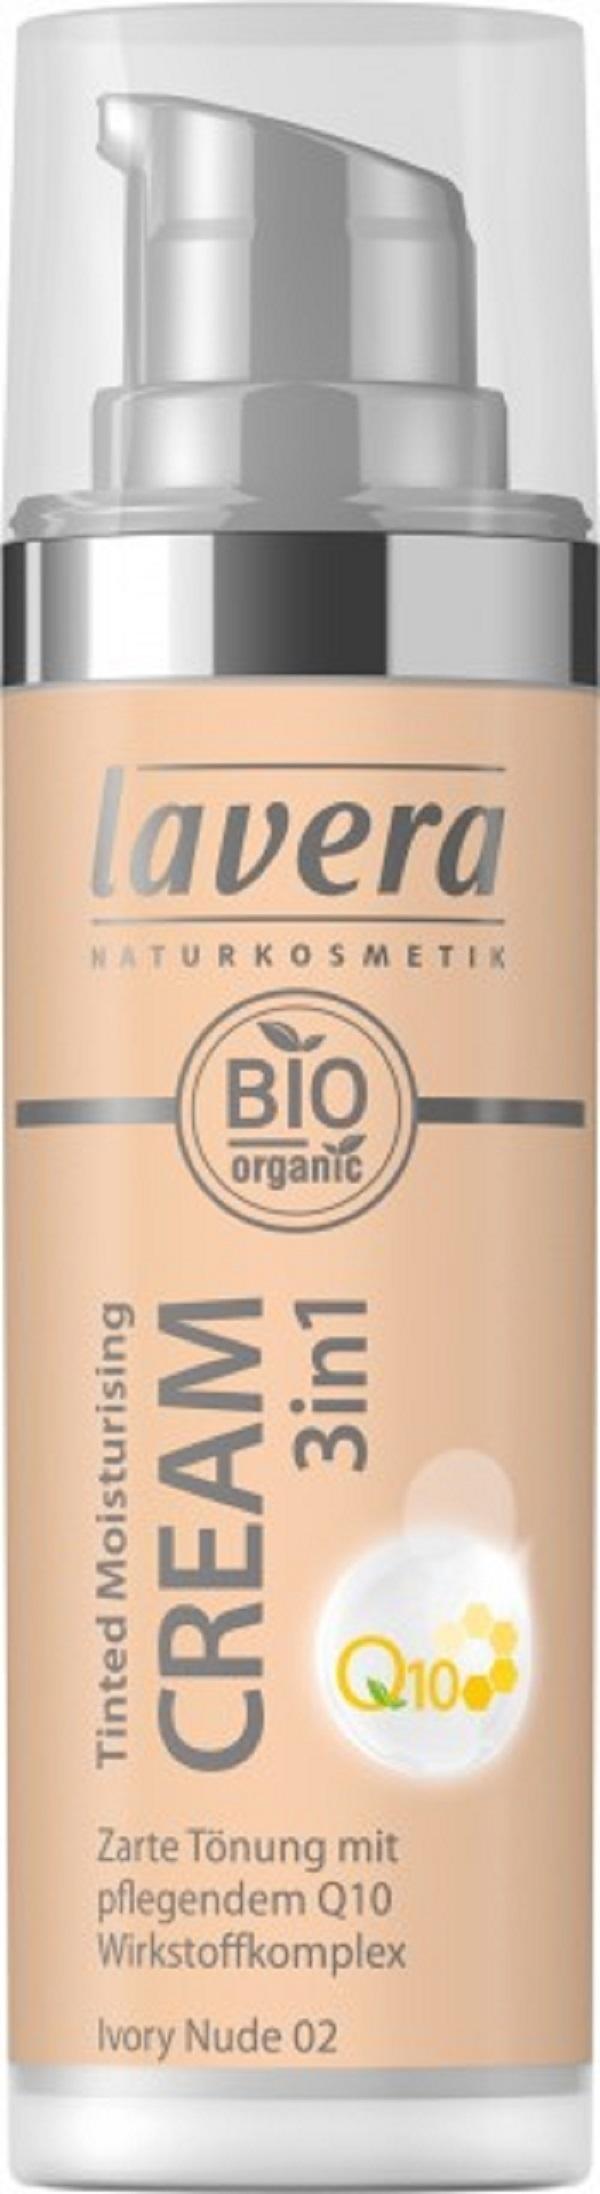 Lavera - Créme hydratante teintée 24h Ivory Nude 02